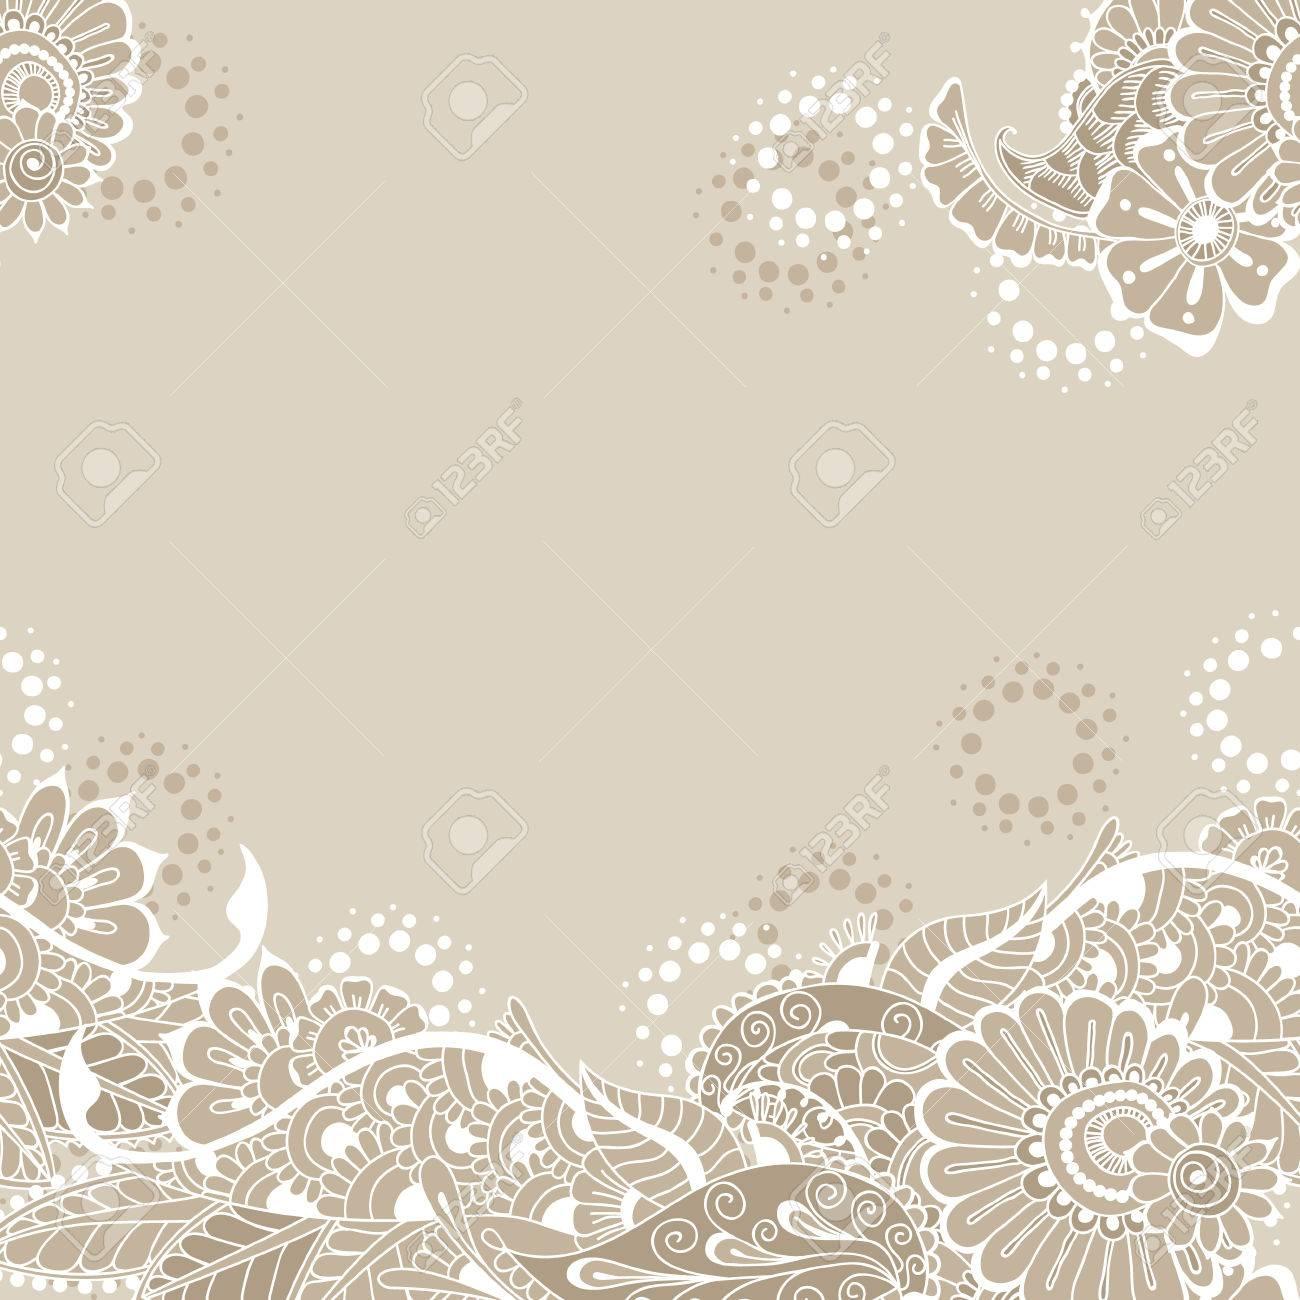 Ornate vector card template in indian mehndi style hand drawn ornate vector card template in indian mehndi style hand drawn abstract background invitation stopboris Images